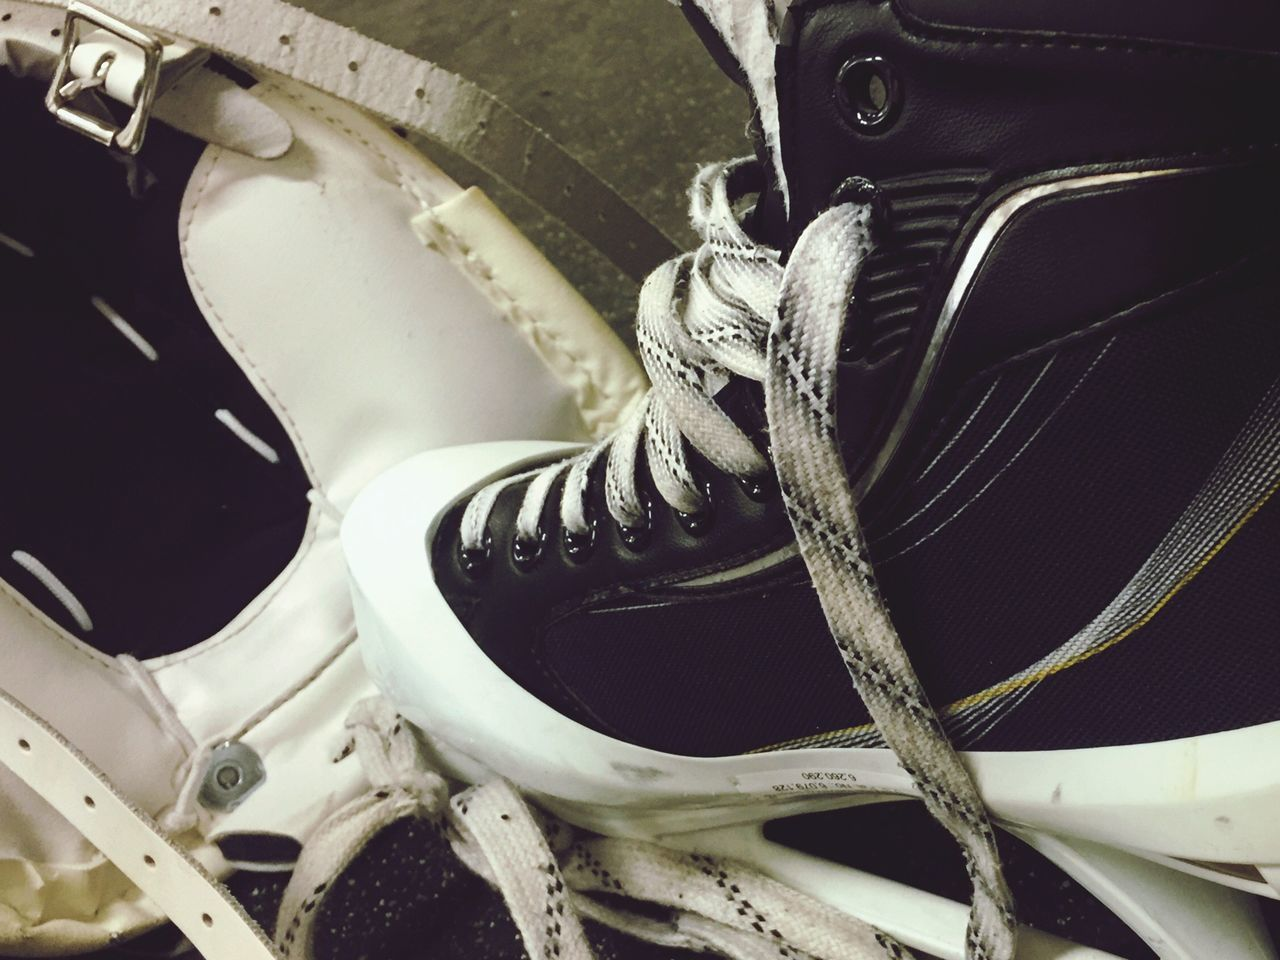 Icehockey Eishockey Schlittschuh Urban Close-up Sport Sports Photography Training Extreme Sports Lifestyles